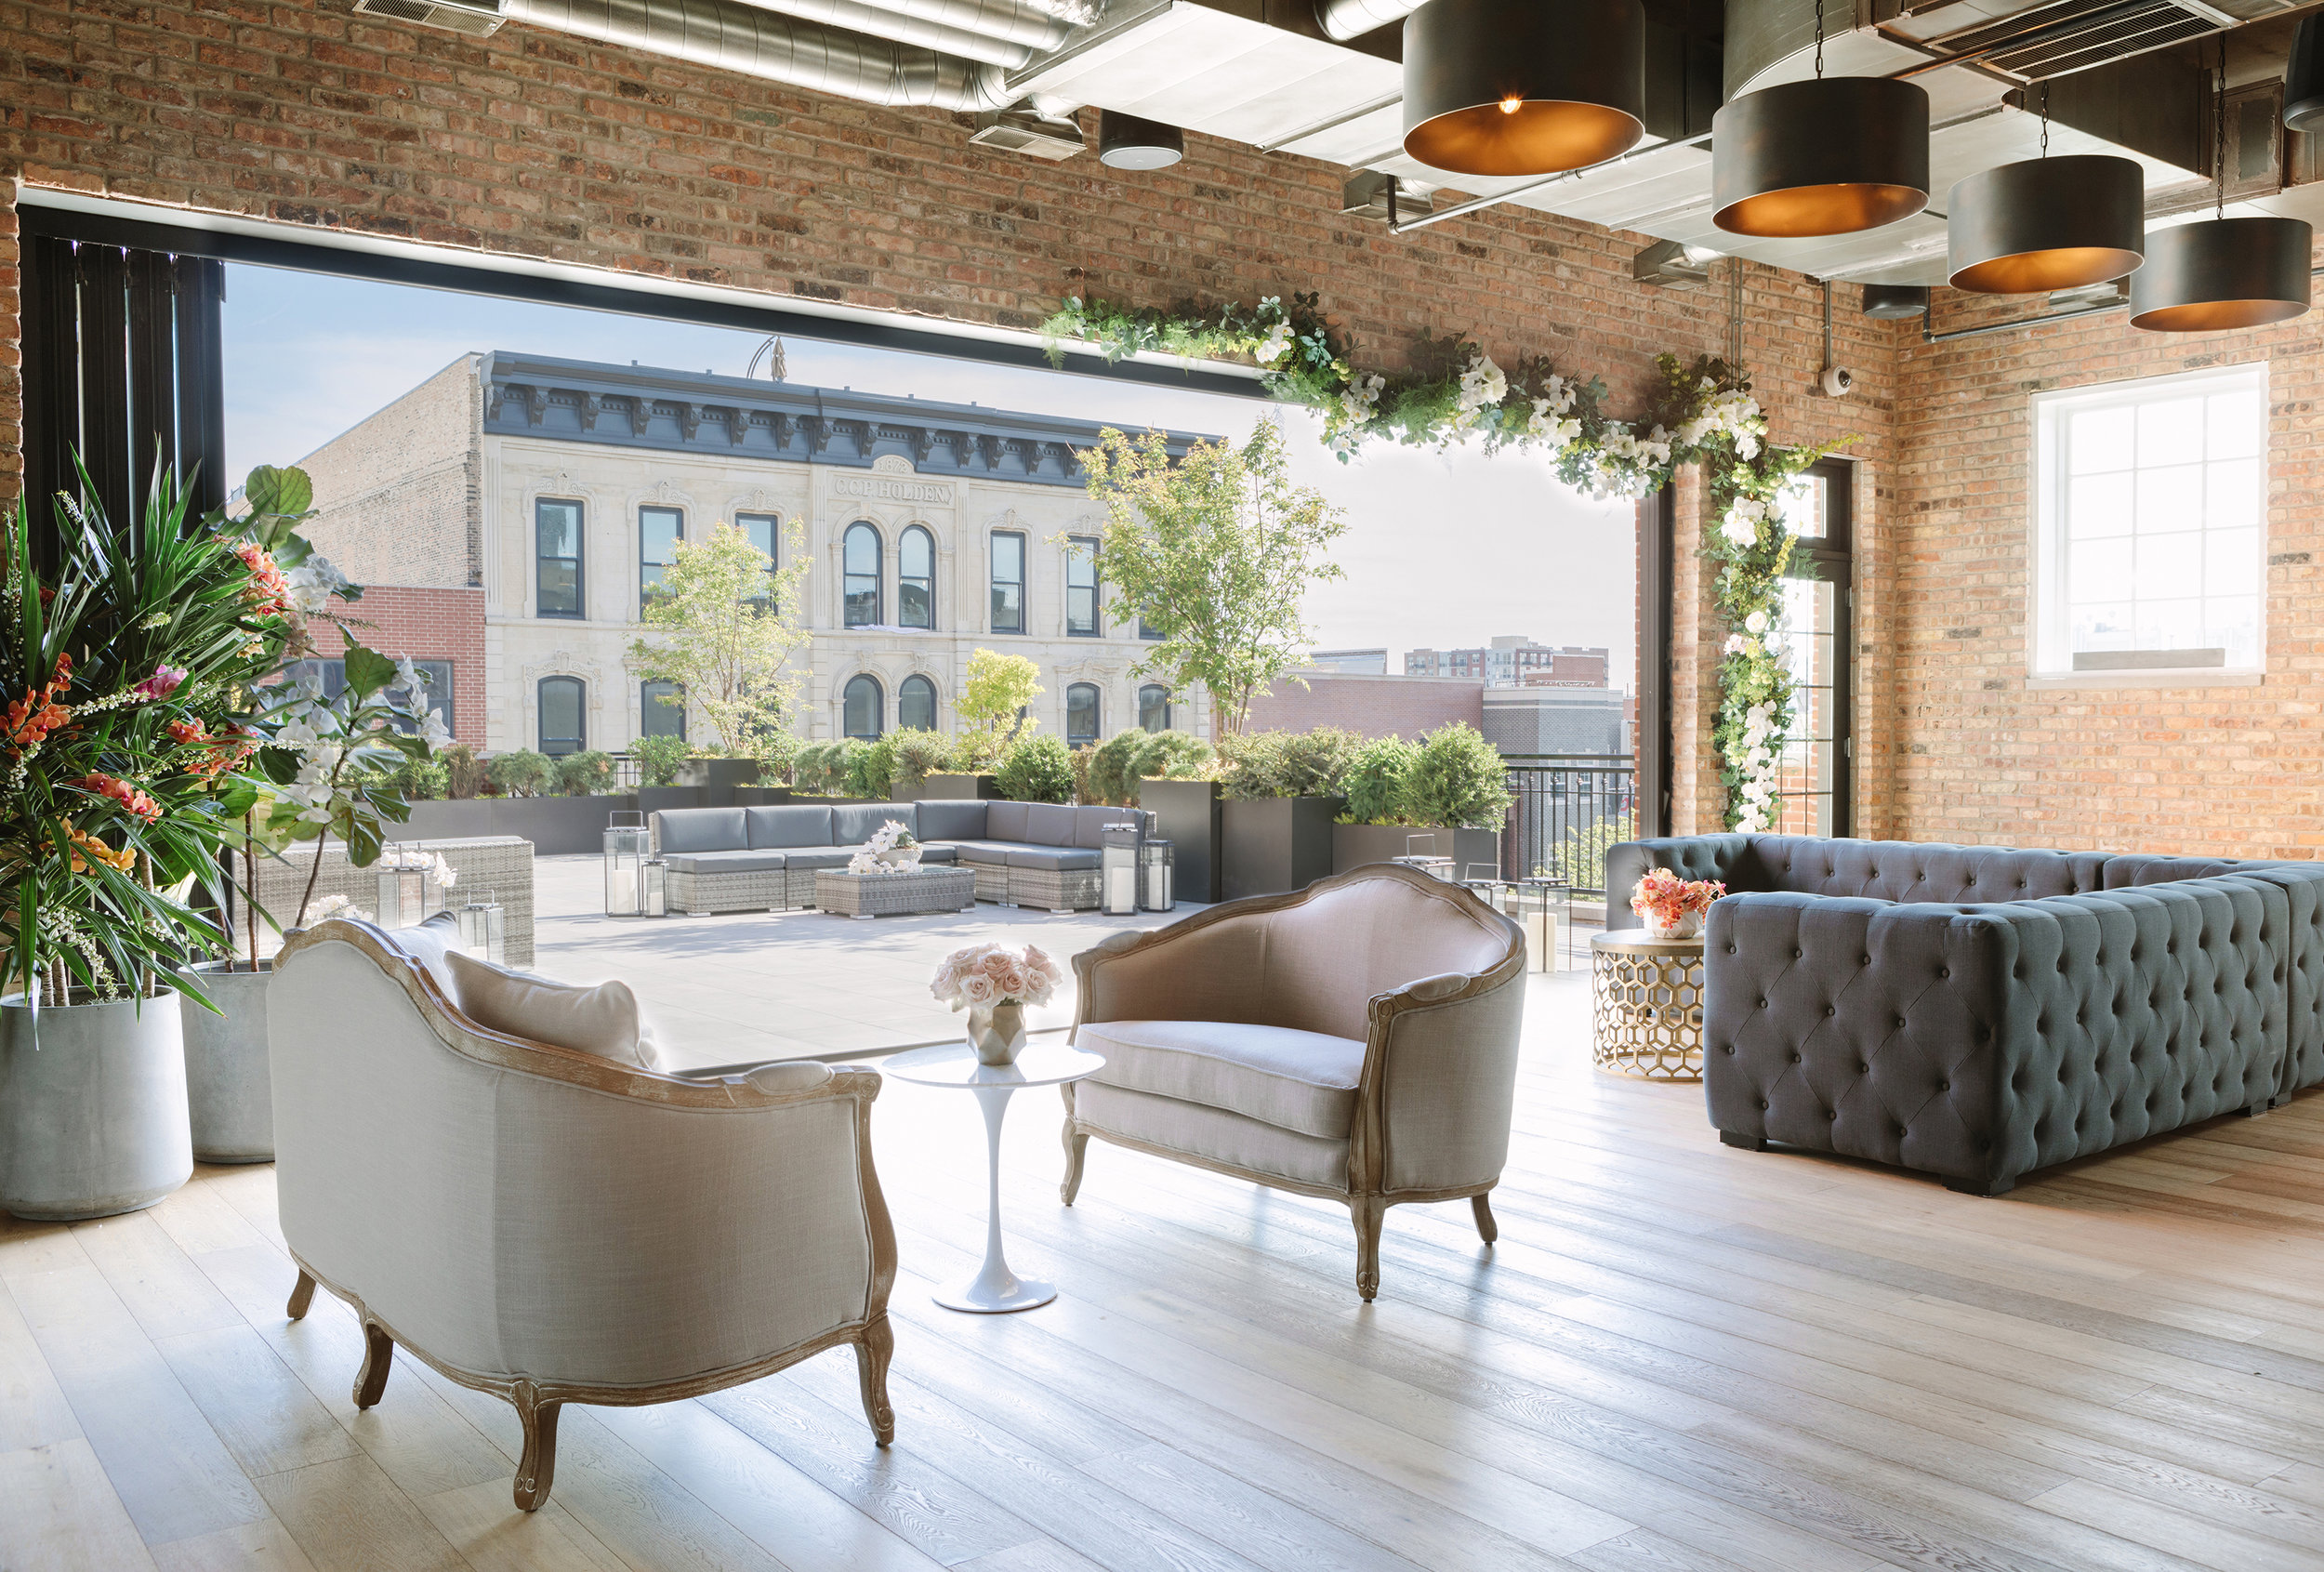 The WEstside loft  Location: West Loop Seated Capacity: 130 Saturday Price: $5,500